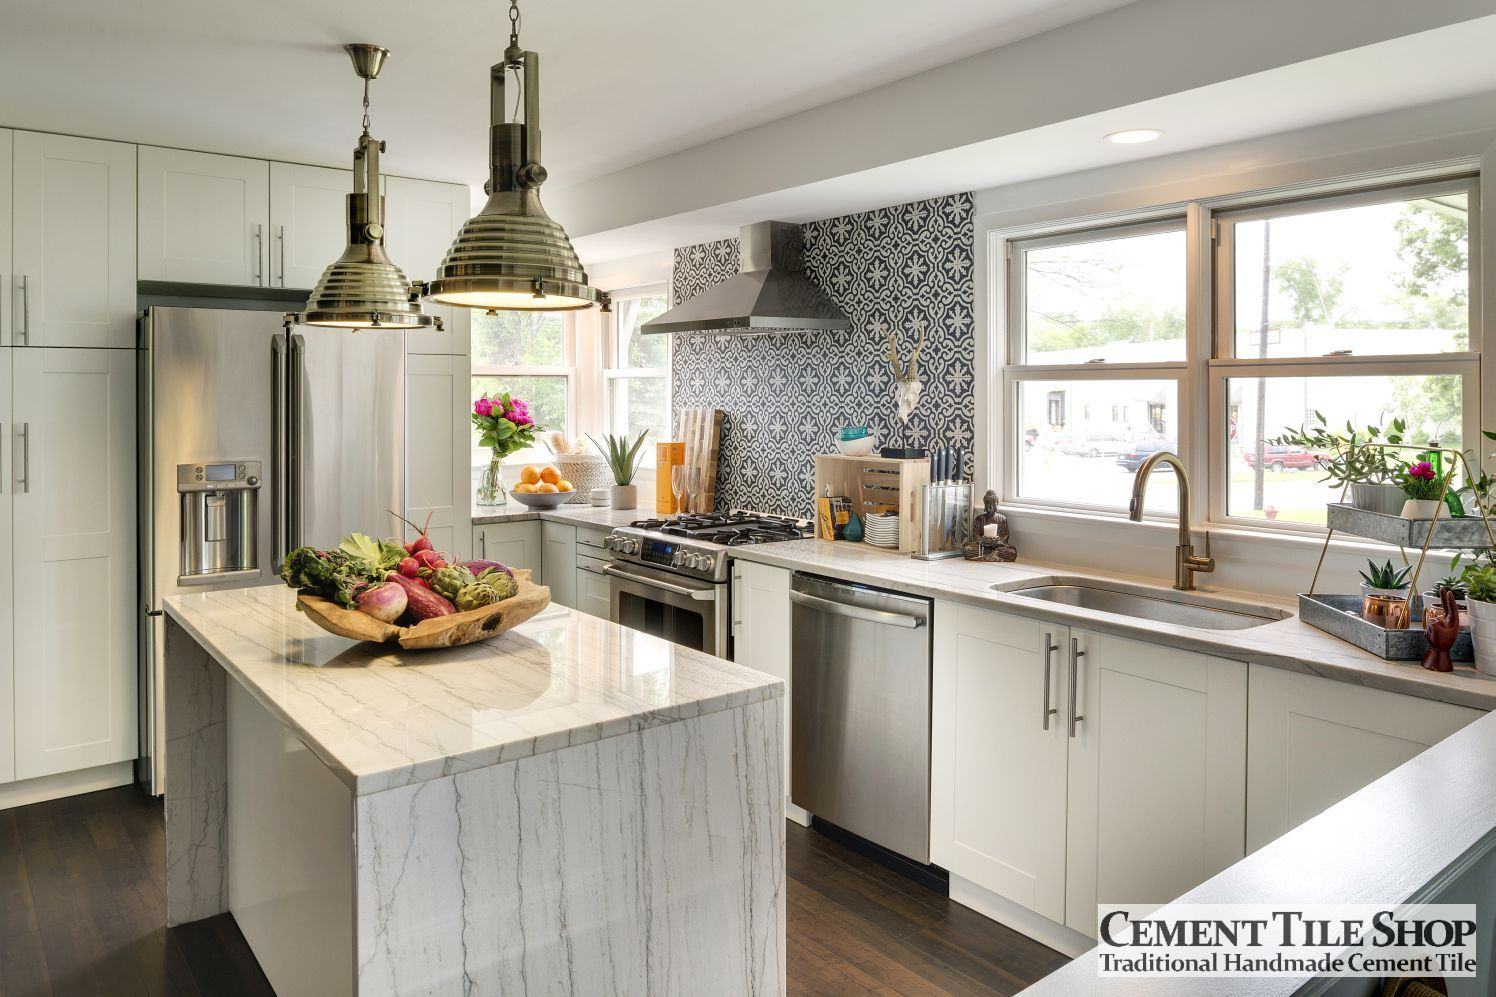 cement tile kitchen blanco silgranit sink backsplash shop blog bordeaux crush collective 2